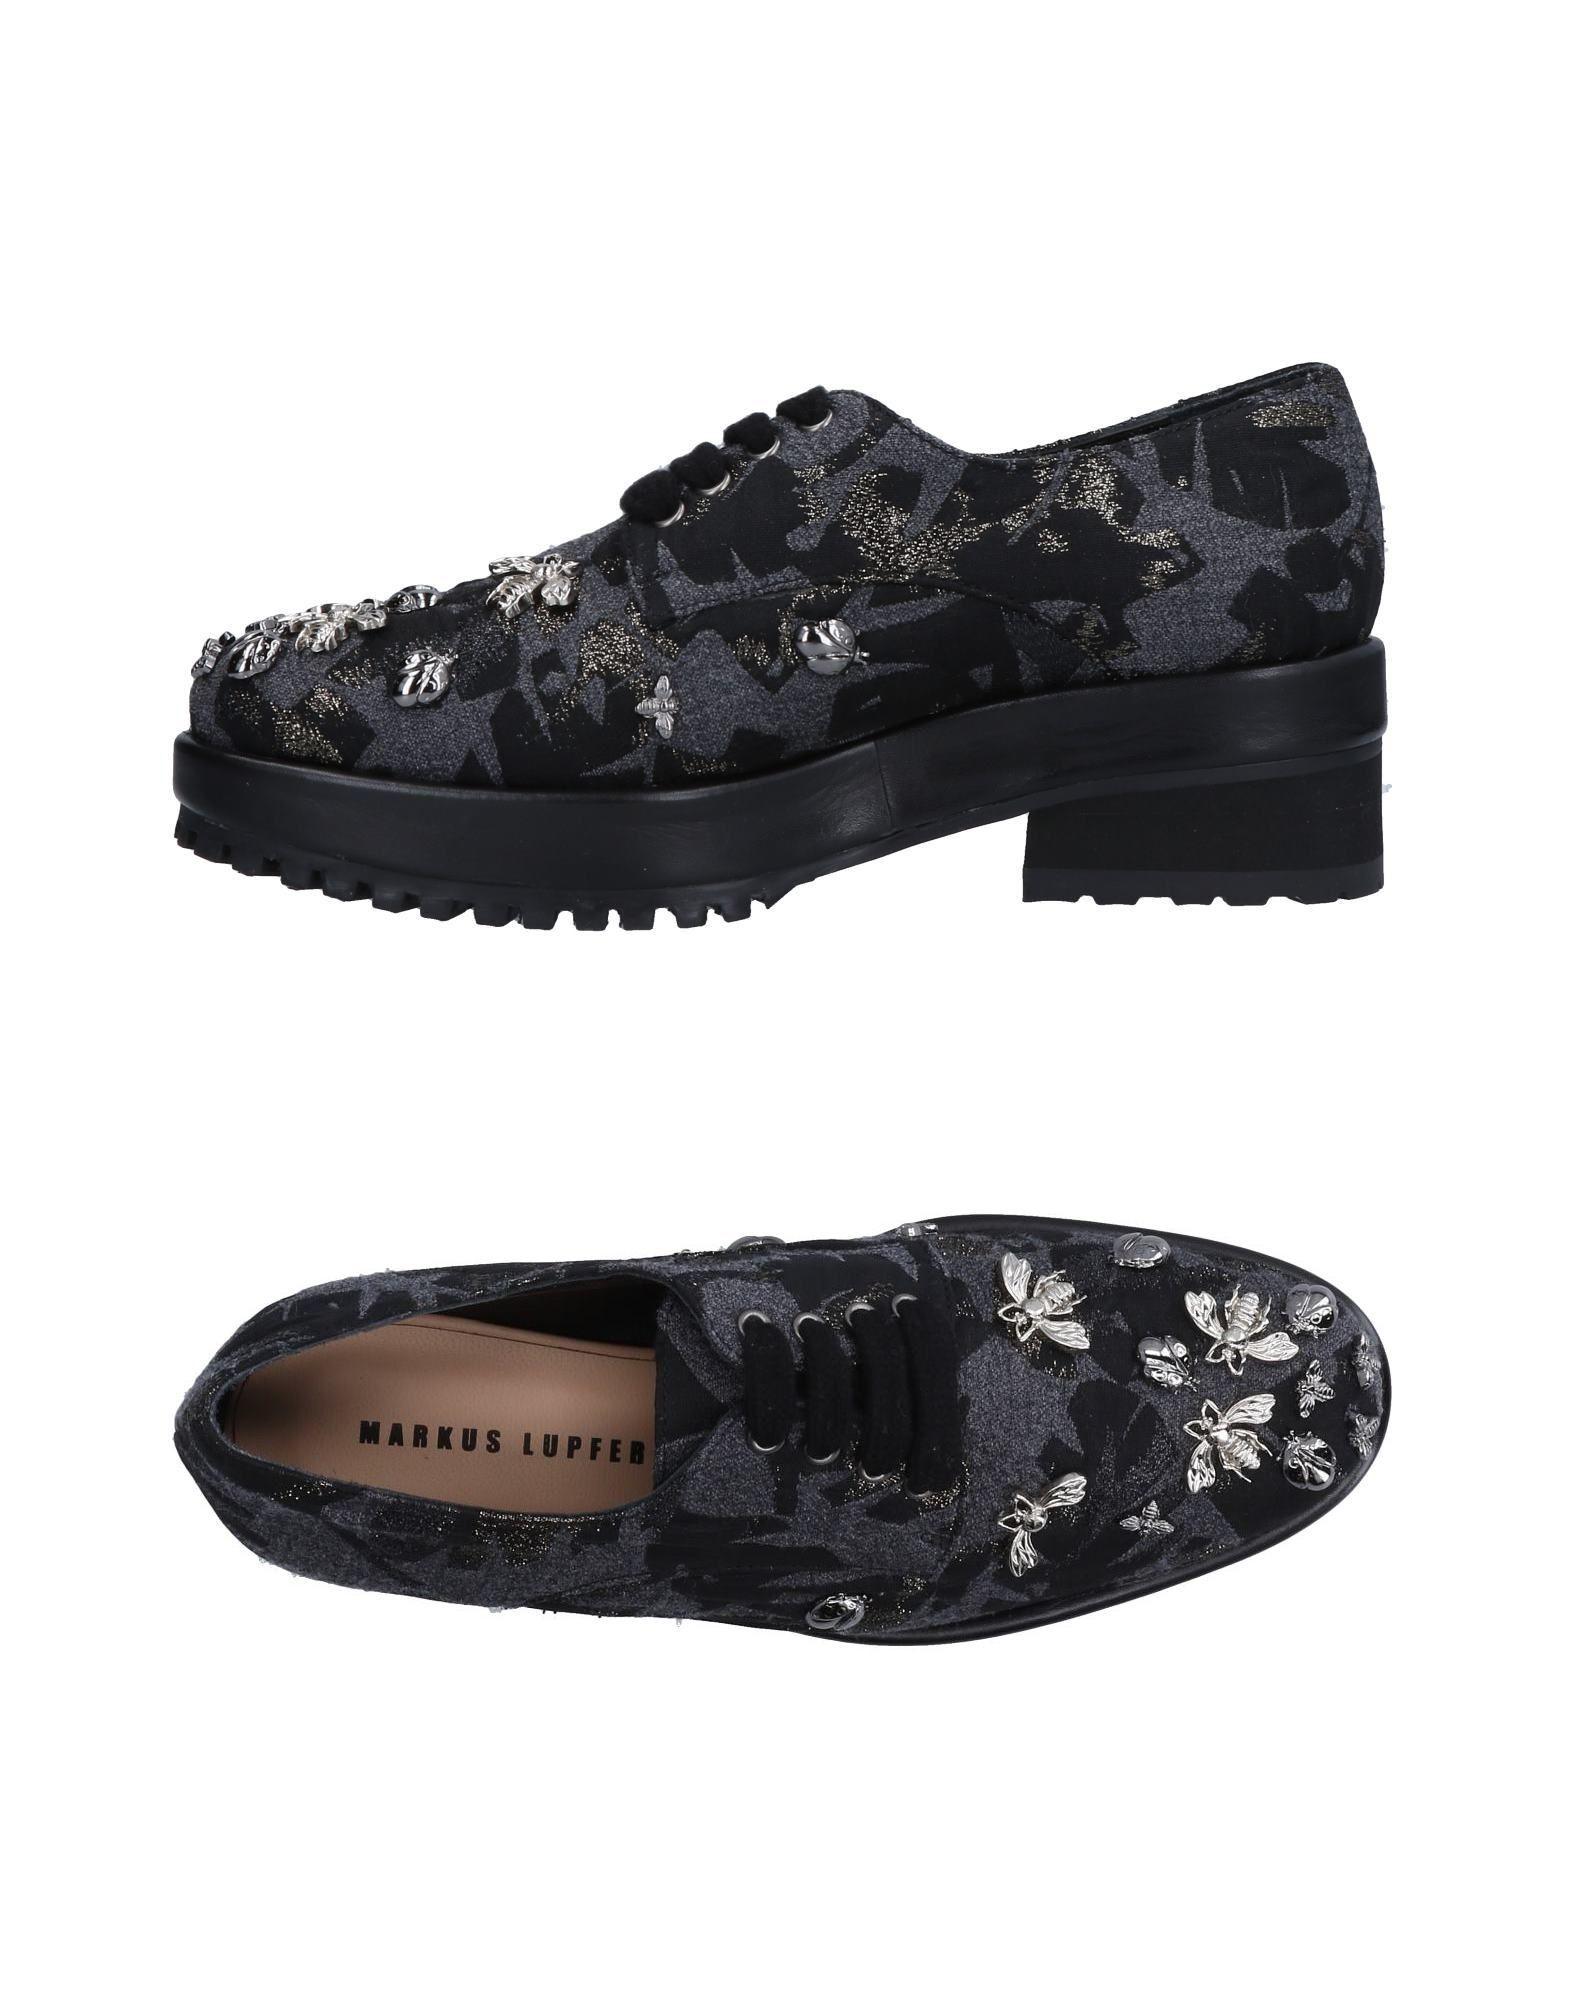 Rabatt Schuhe Markus Damen Lupfer Schnürschuhe Damen Markus  11518418UD 220f23